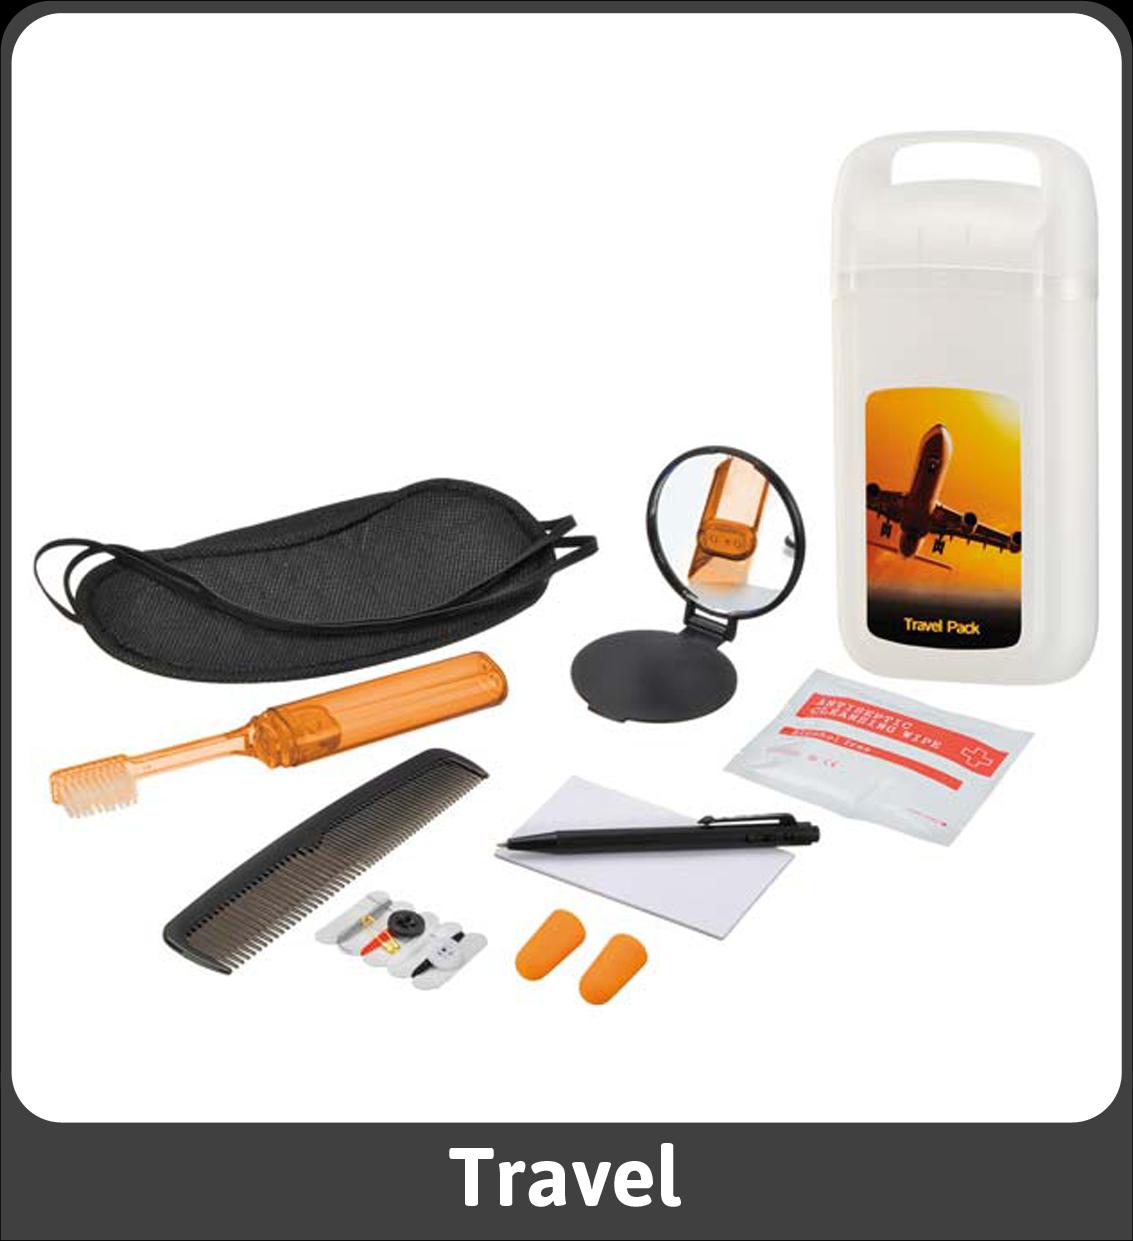 Travel Panel